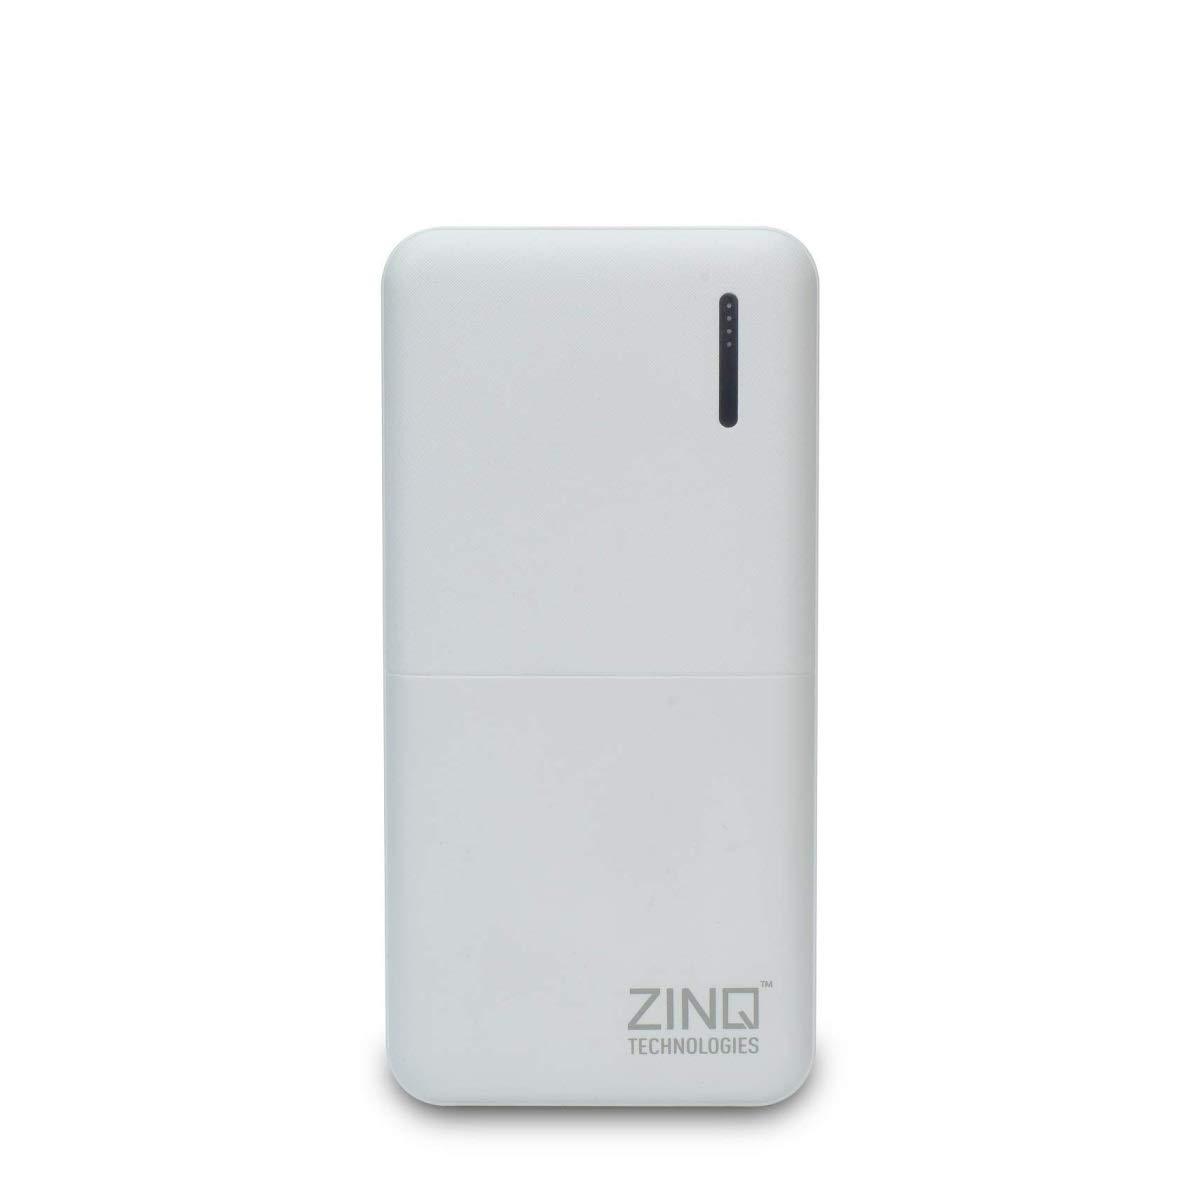 Zinq Technologies Z20KPB 20000mAh Lithium Polymer Power Bank with Dual USB Output (White)